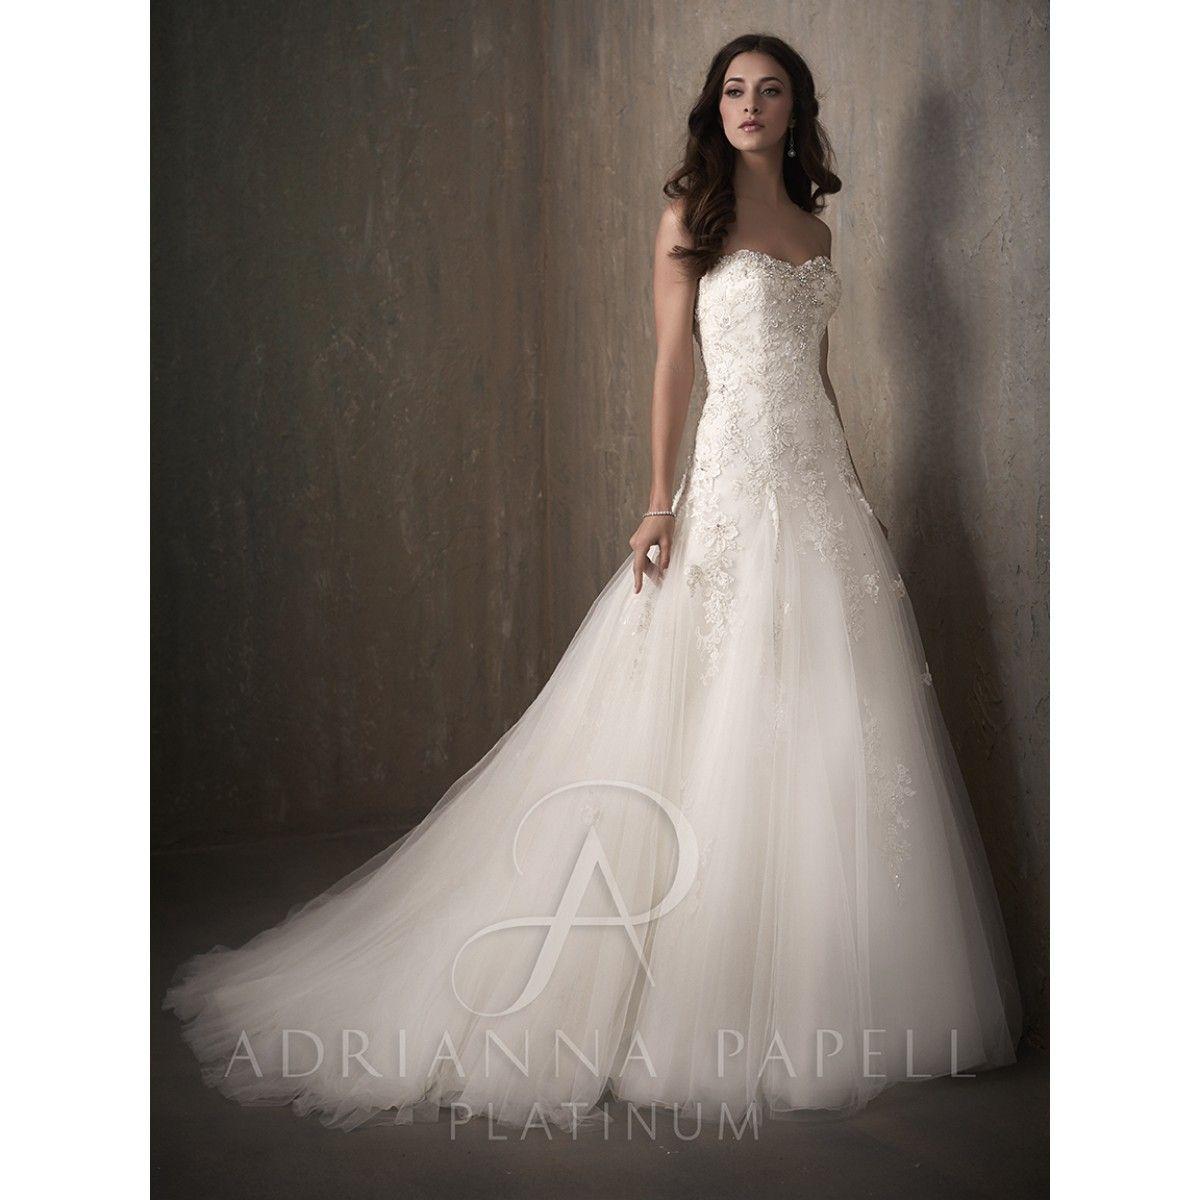 New | Style 31022 - Adrianna Papell Platinum